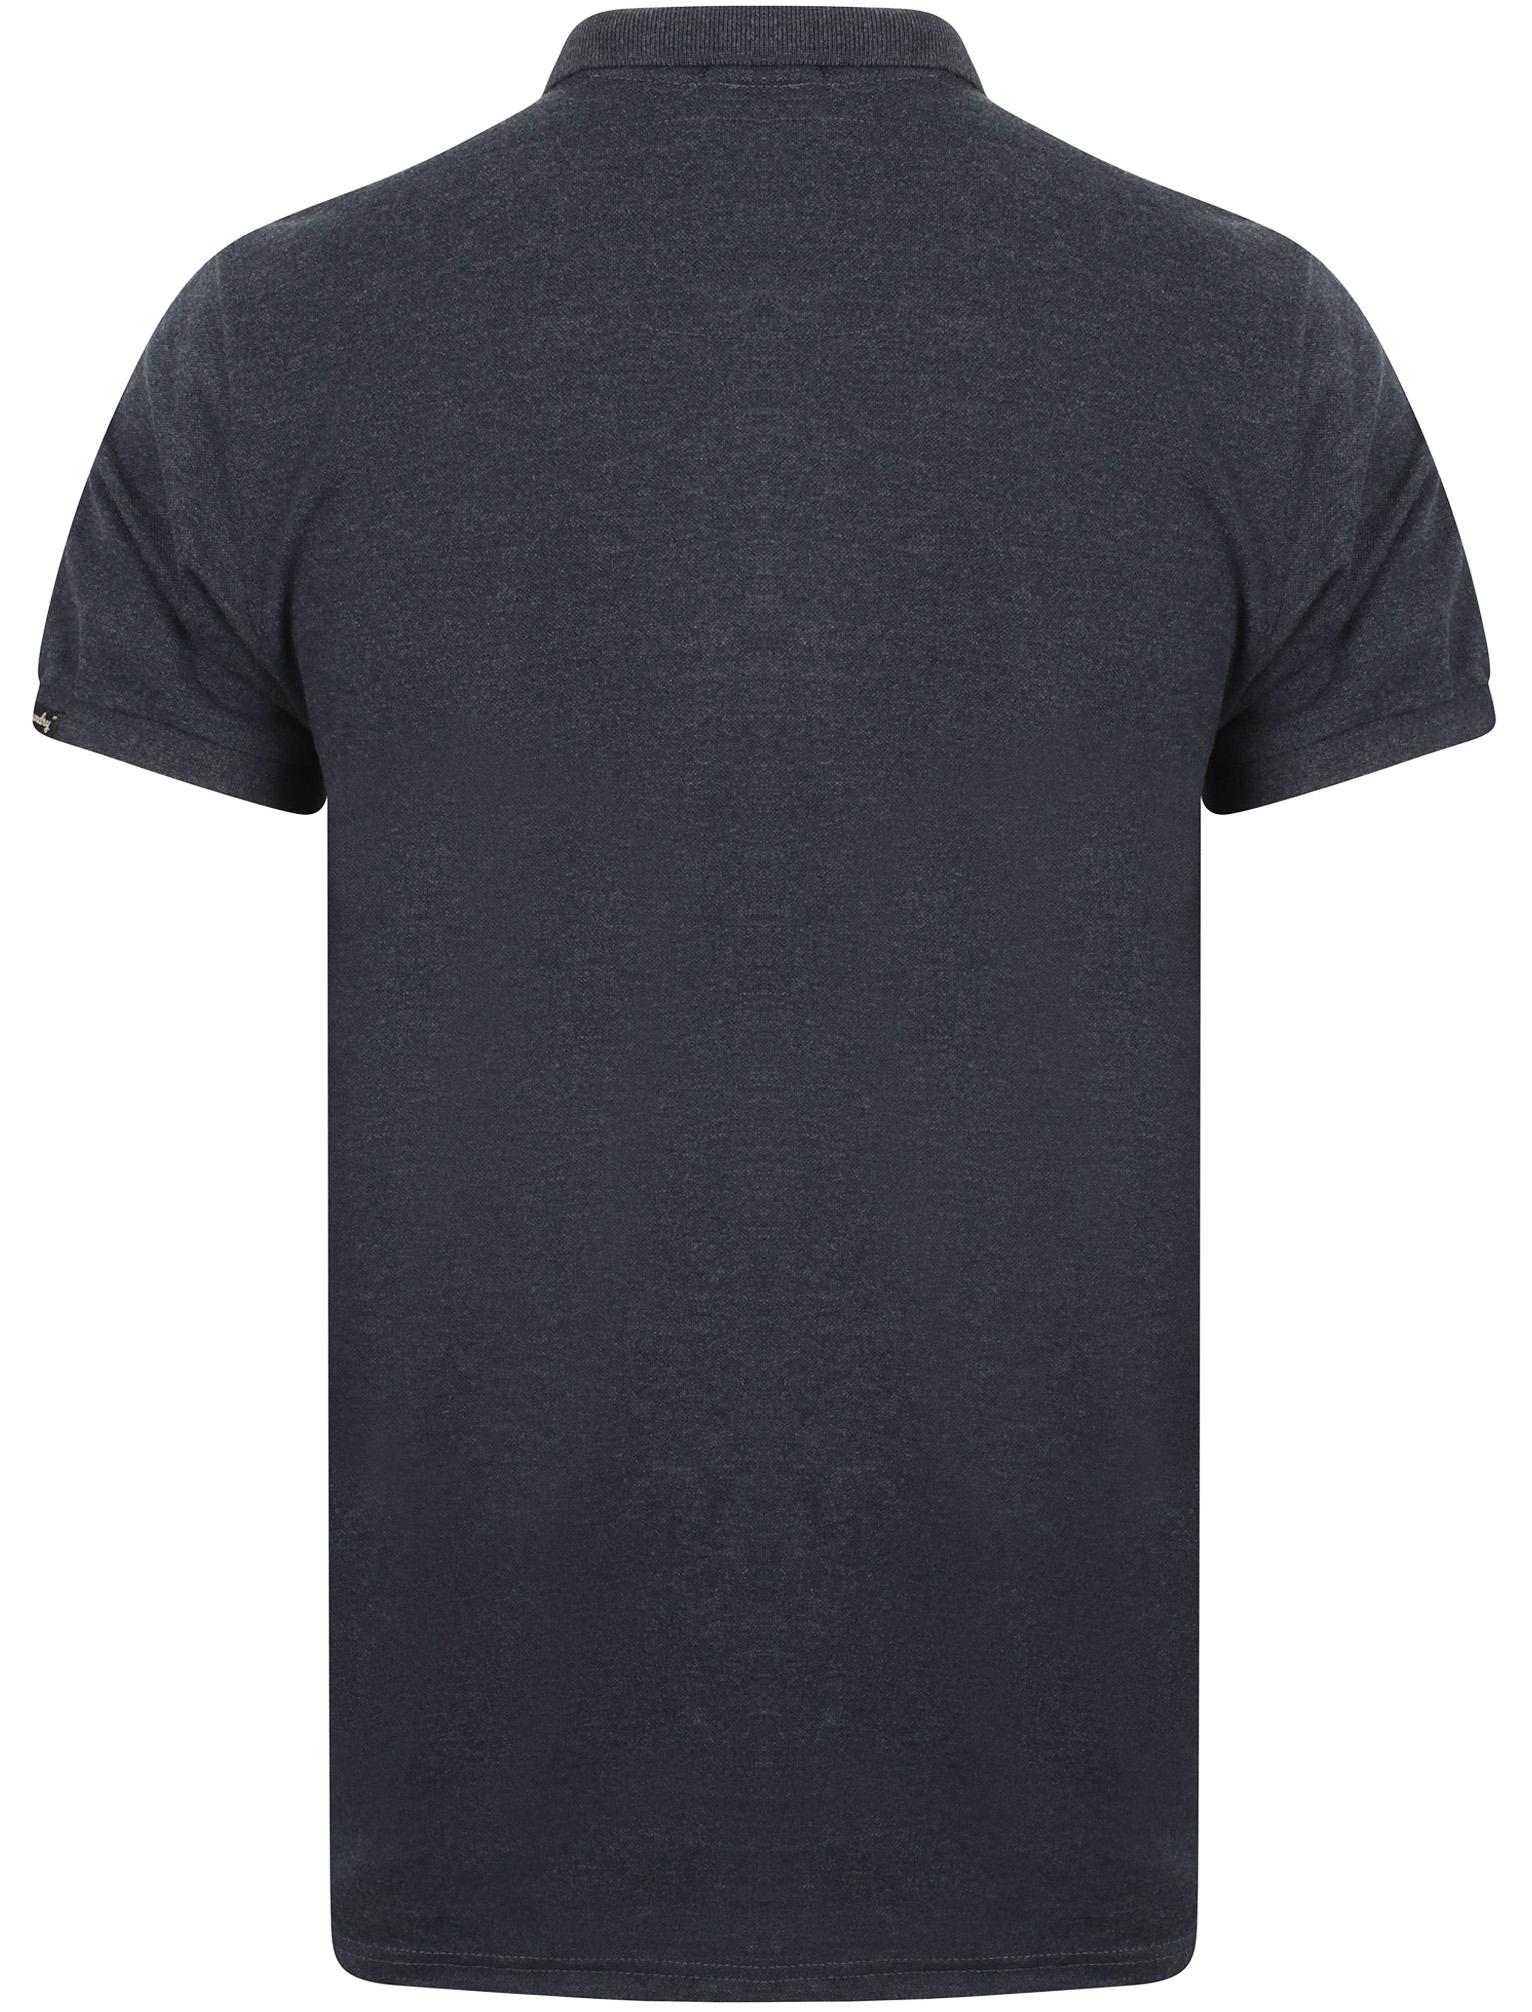 New-Mens-Tokyo-Laundry-Branded-Kuusamo-Cotton-Rich-Pique-Polo-Shirt-Size-S-XXL thumbnail 15